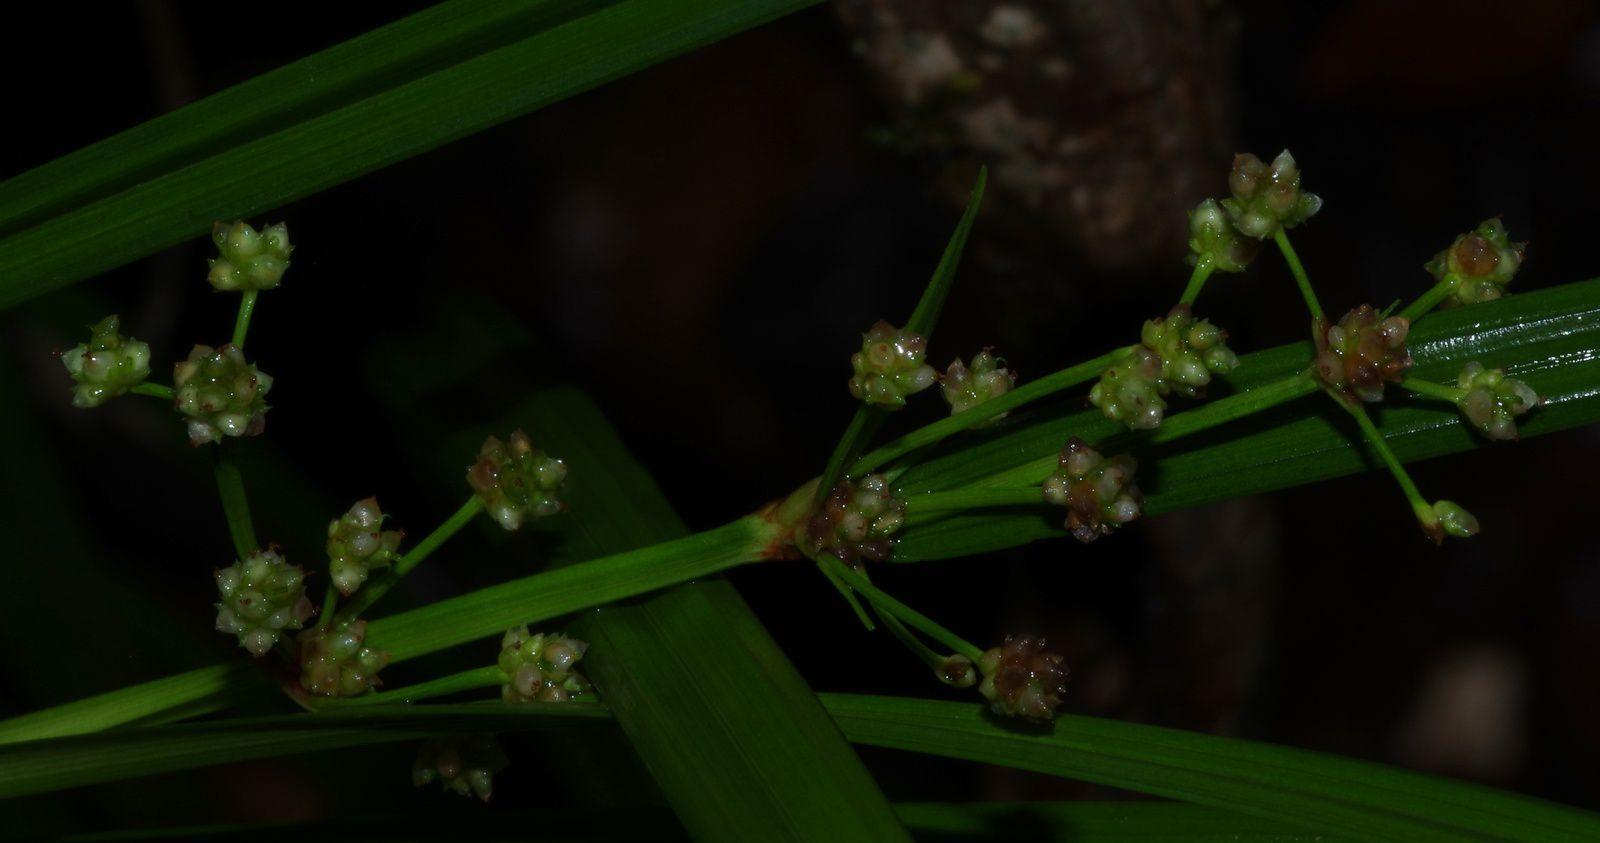 Calyptrocarya glomerulata